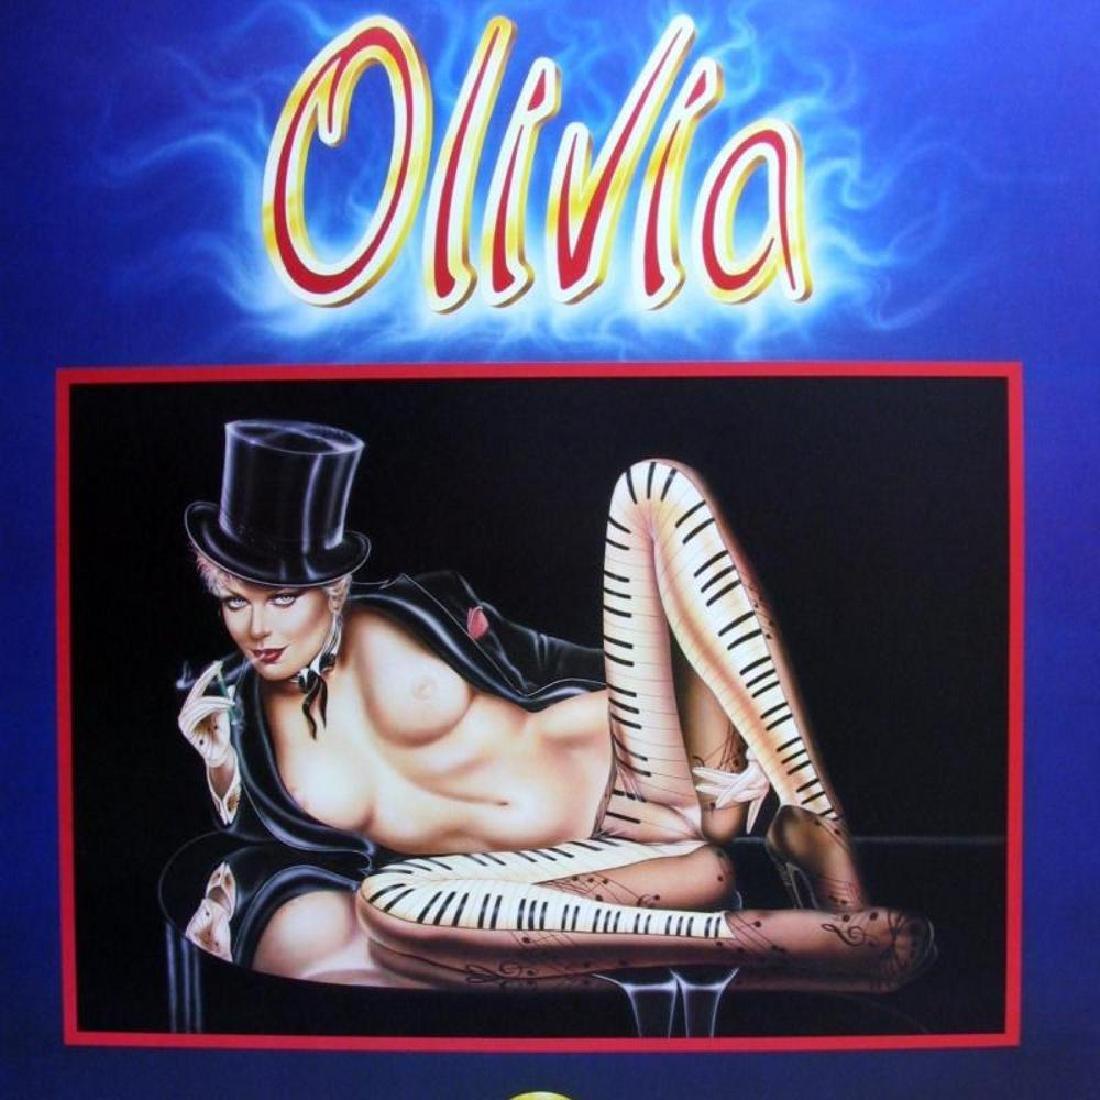 MUSICAL OLIVIA PIANO NUDE RARE FINE ART PRINT SALE - 3